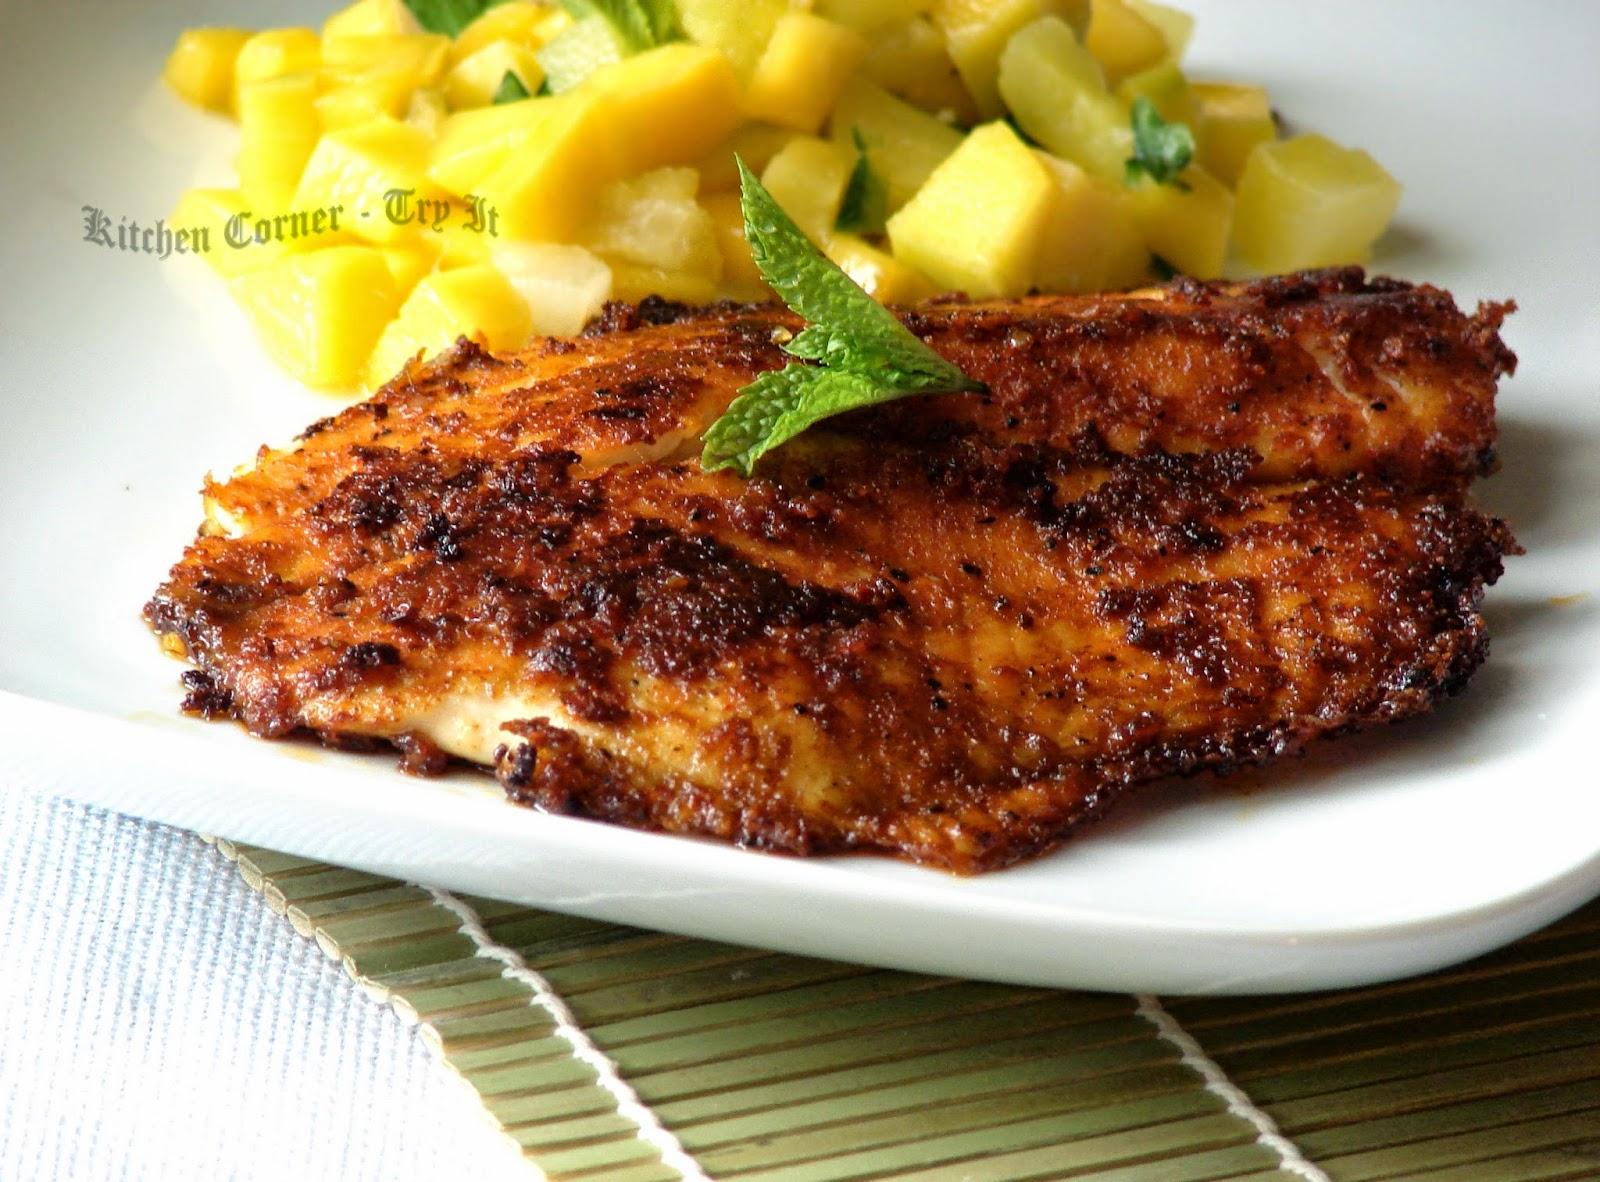 Kitchen corner try it cajun spiced tilapia for Cajun fish recipes